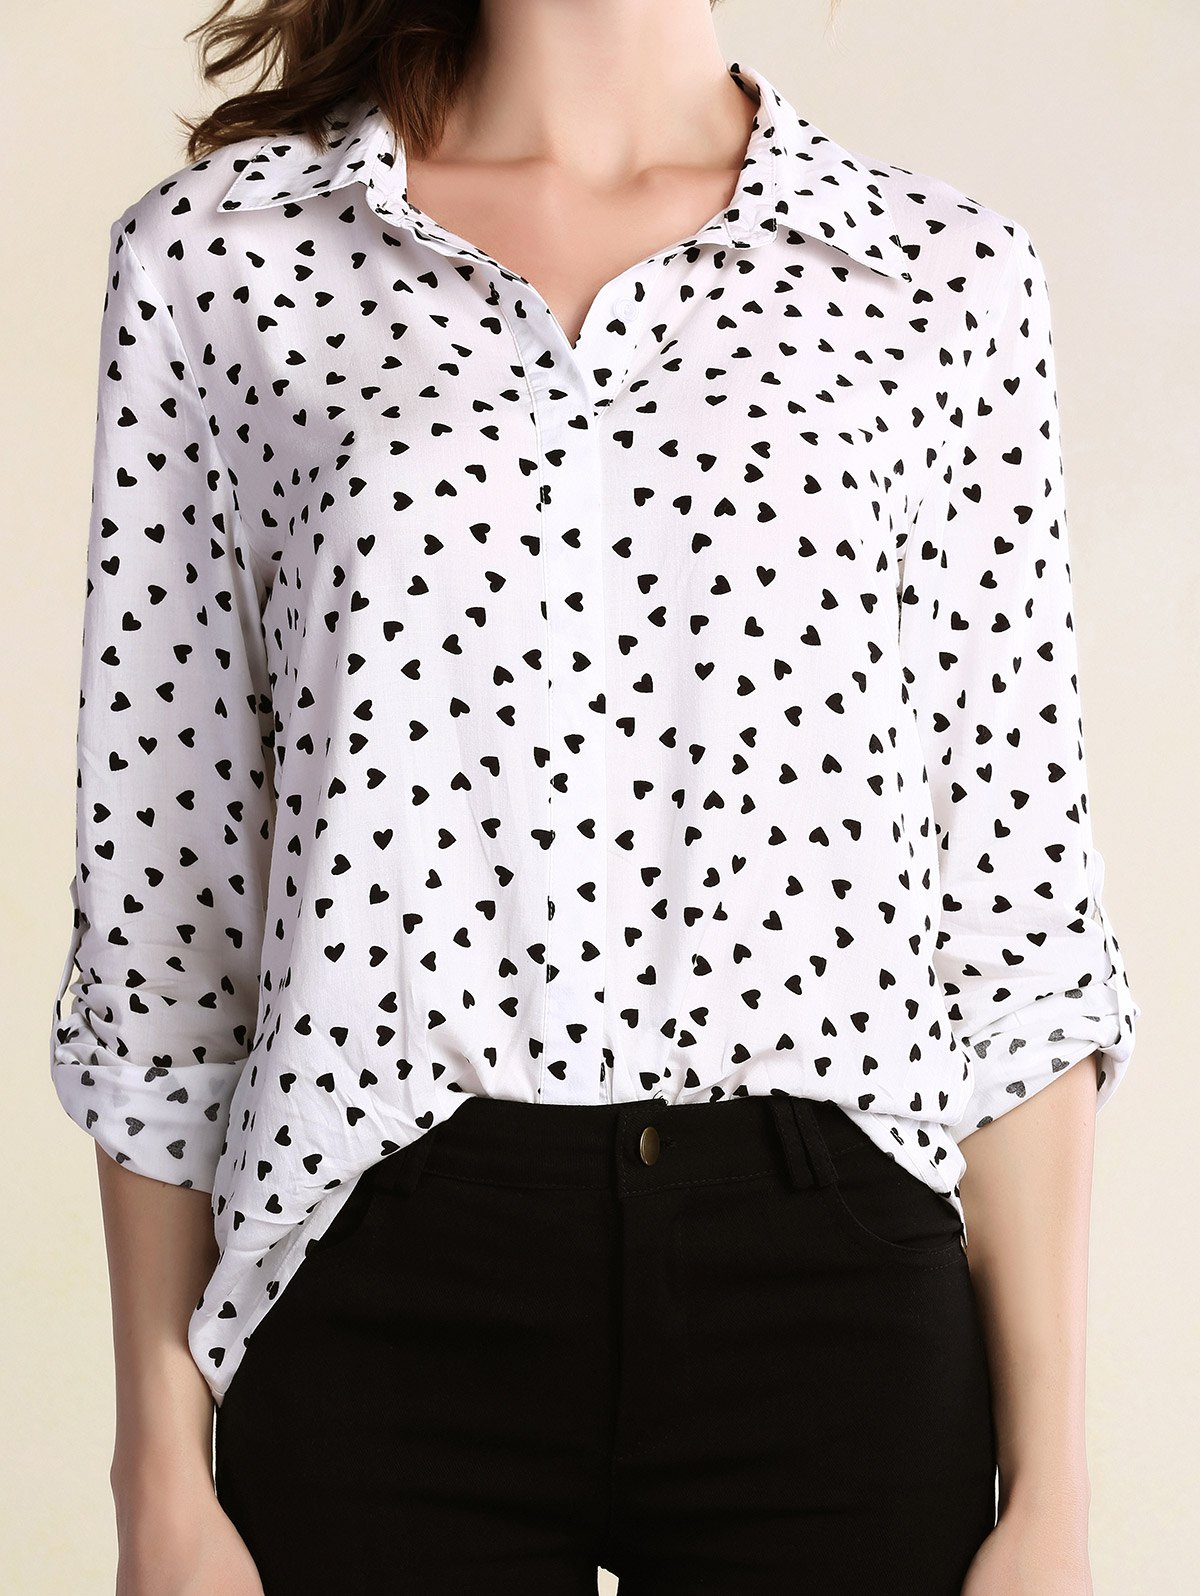 Turn Down Collar Long Sleeve Full Heart Print Shirt